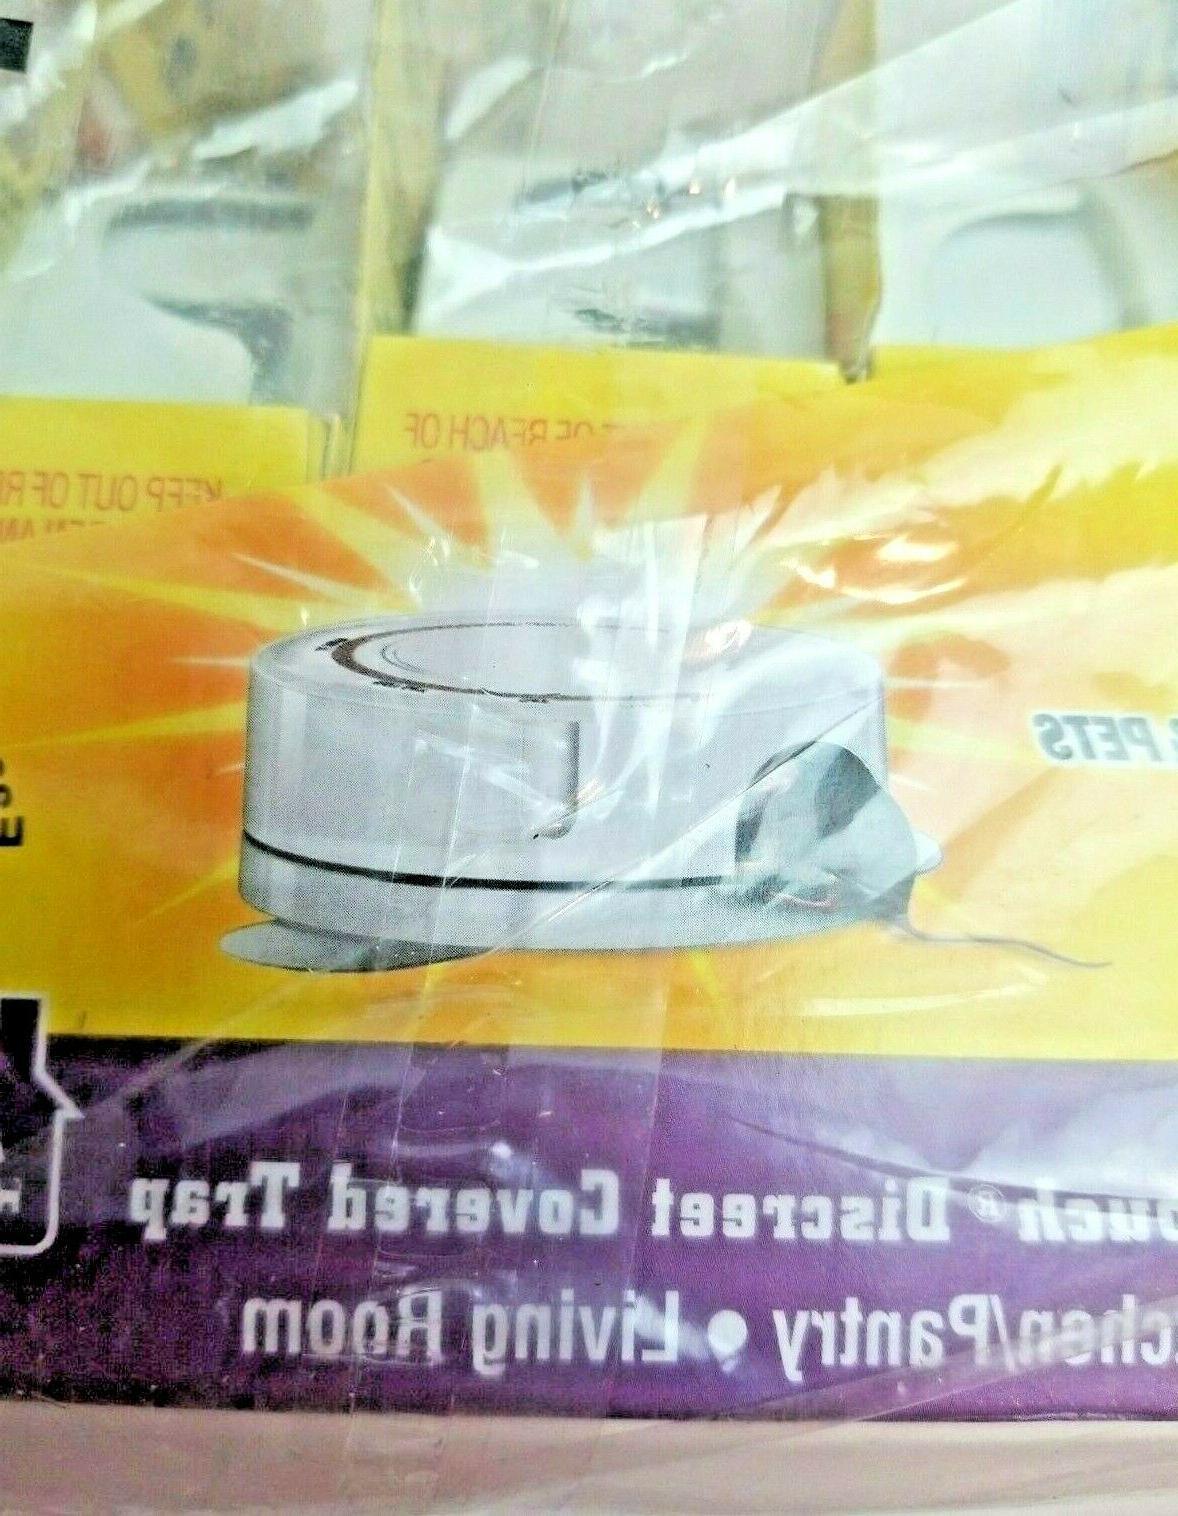 NEW! d-Con Mice Poison Mouse Discreet Traps